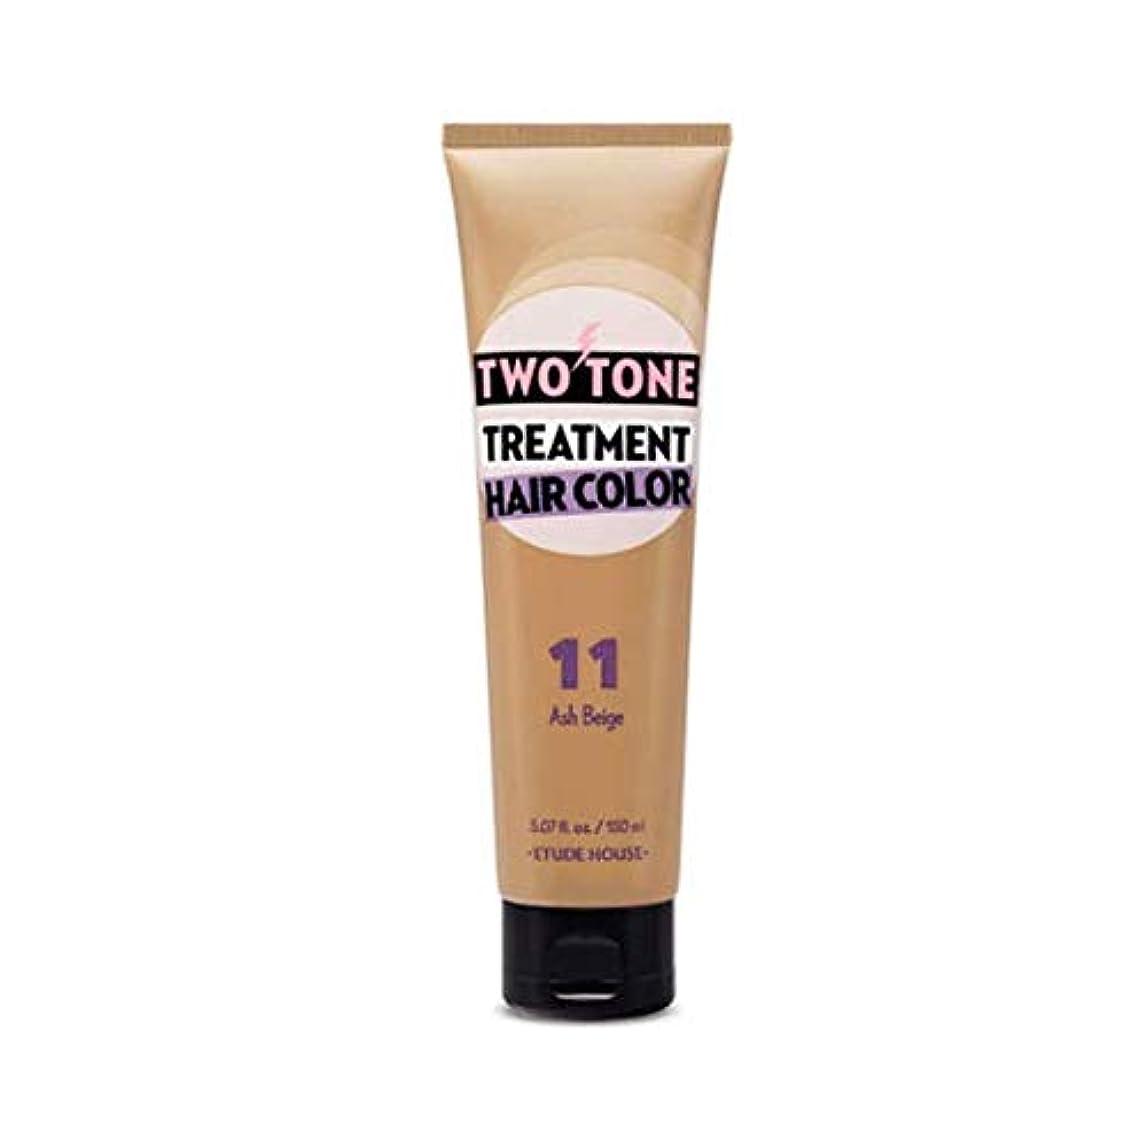 ETUDE HOUSE Two Tone Treatment Hair Color *11 Ash Beige/エチュードハウス ツートントリートメントヘアカラー150ml [並行輸入品]